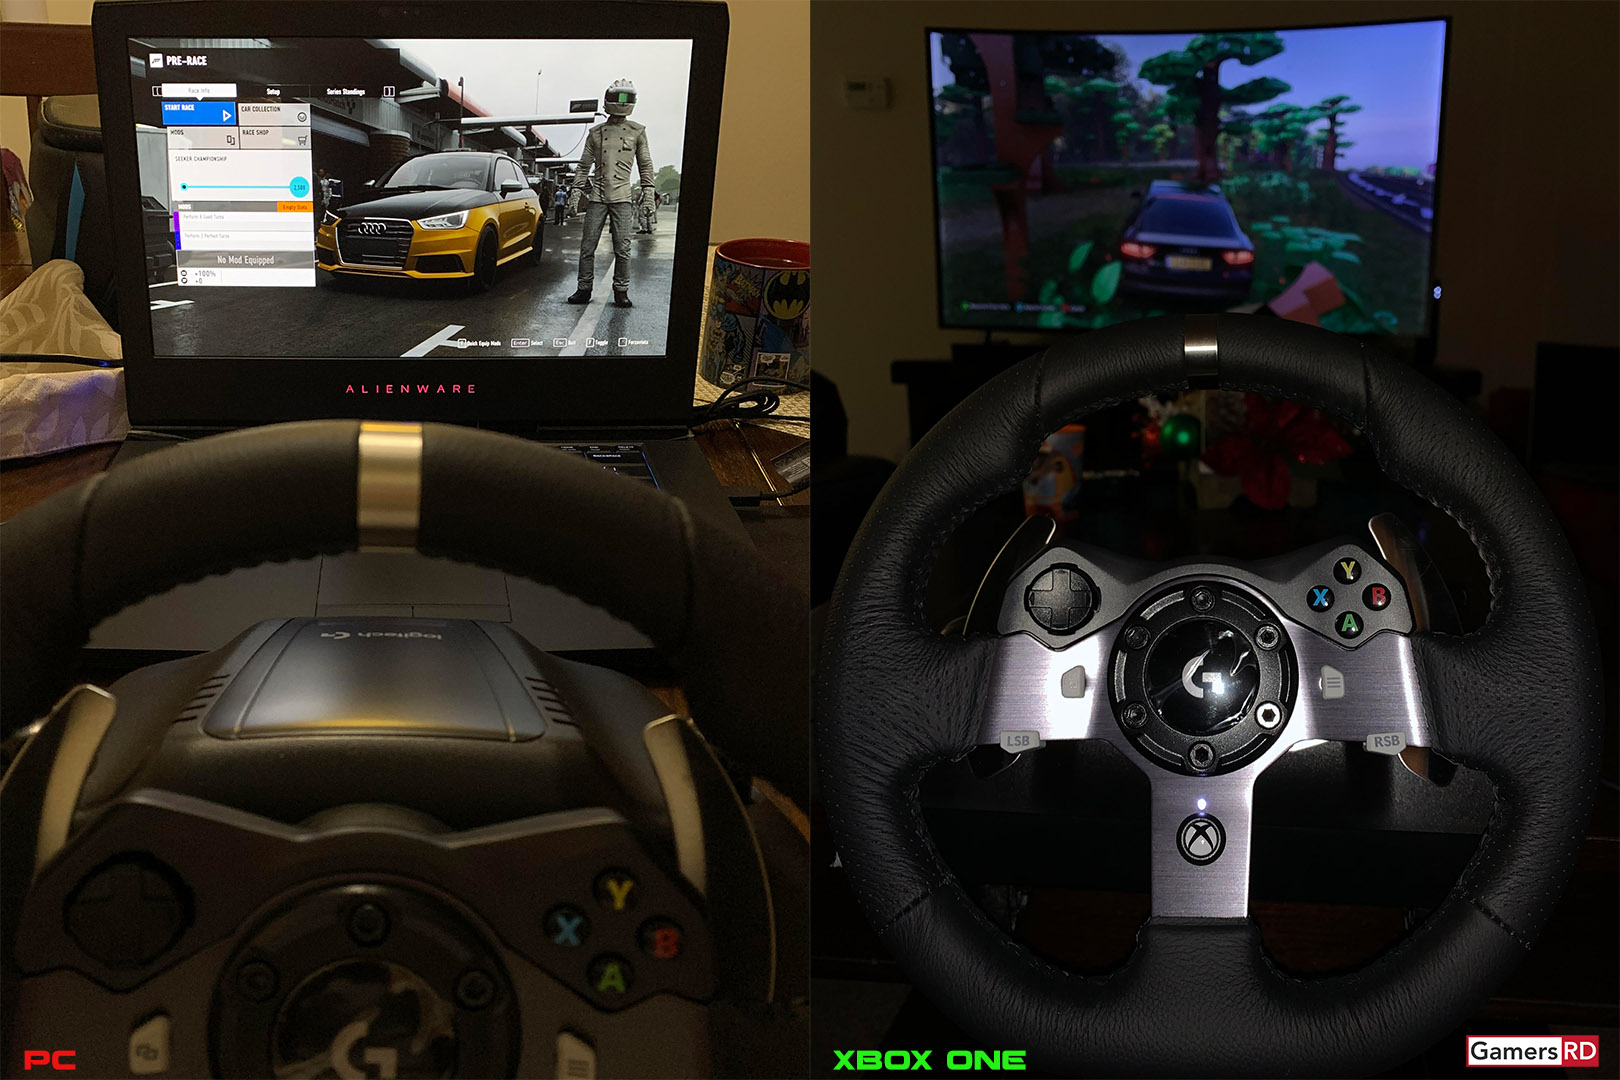 Logitech G920 Driving Force Racing Wheel Review, 6 GamerSRD